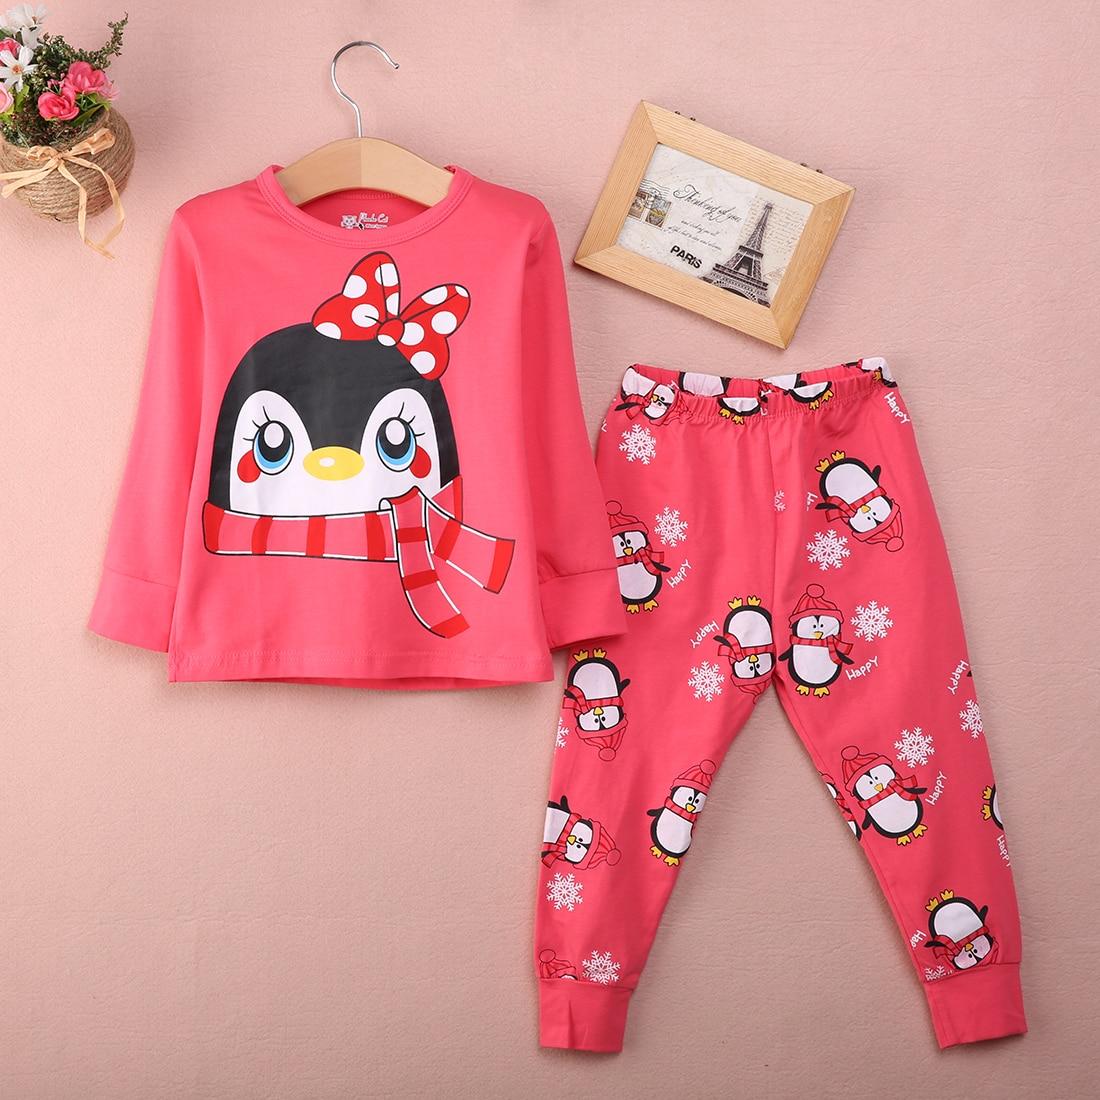 6efccc2ee Toddler Baby Girls Pajamas Summer Set Sleepwear Child Clothes Cute ...